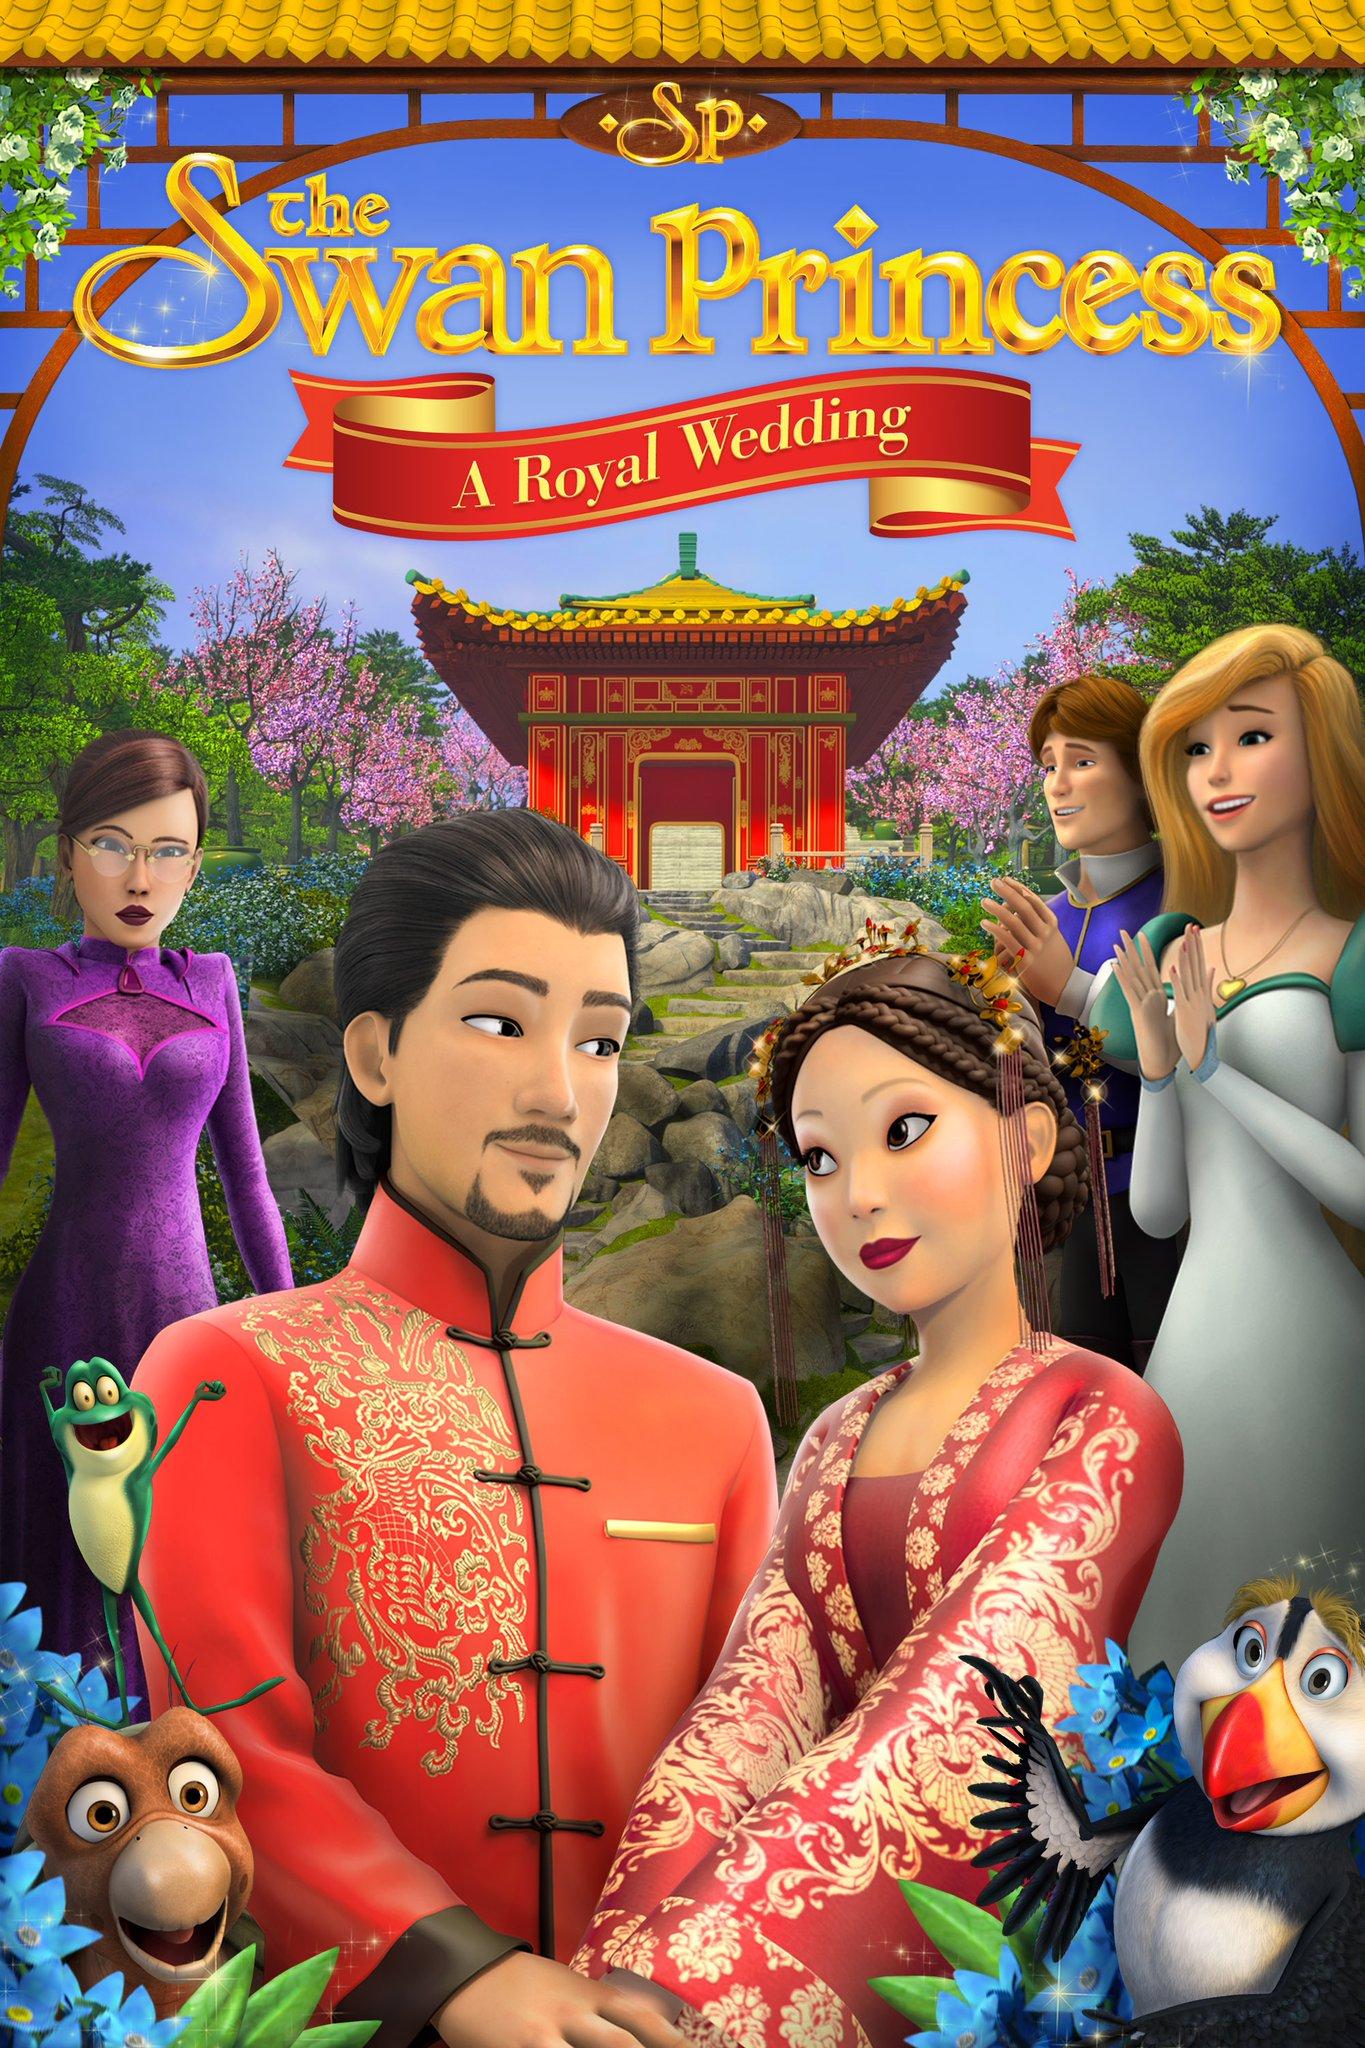 The Swan Princess: A Royal Wedding hd on soap2day